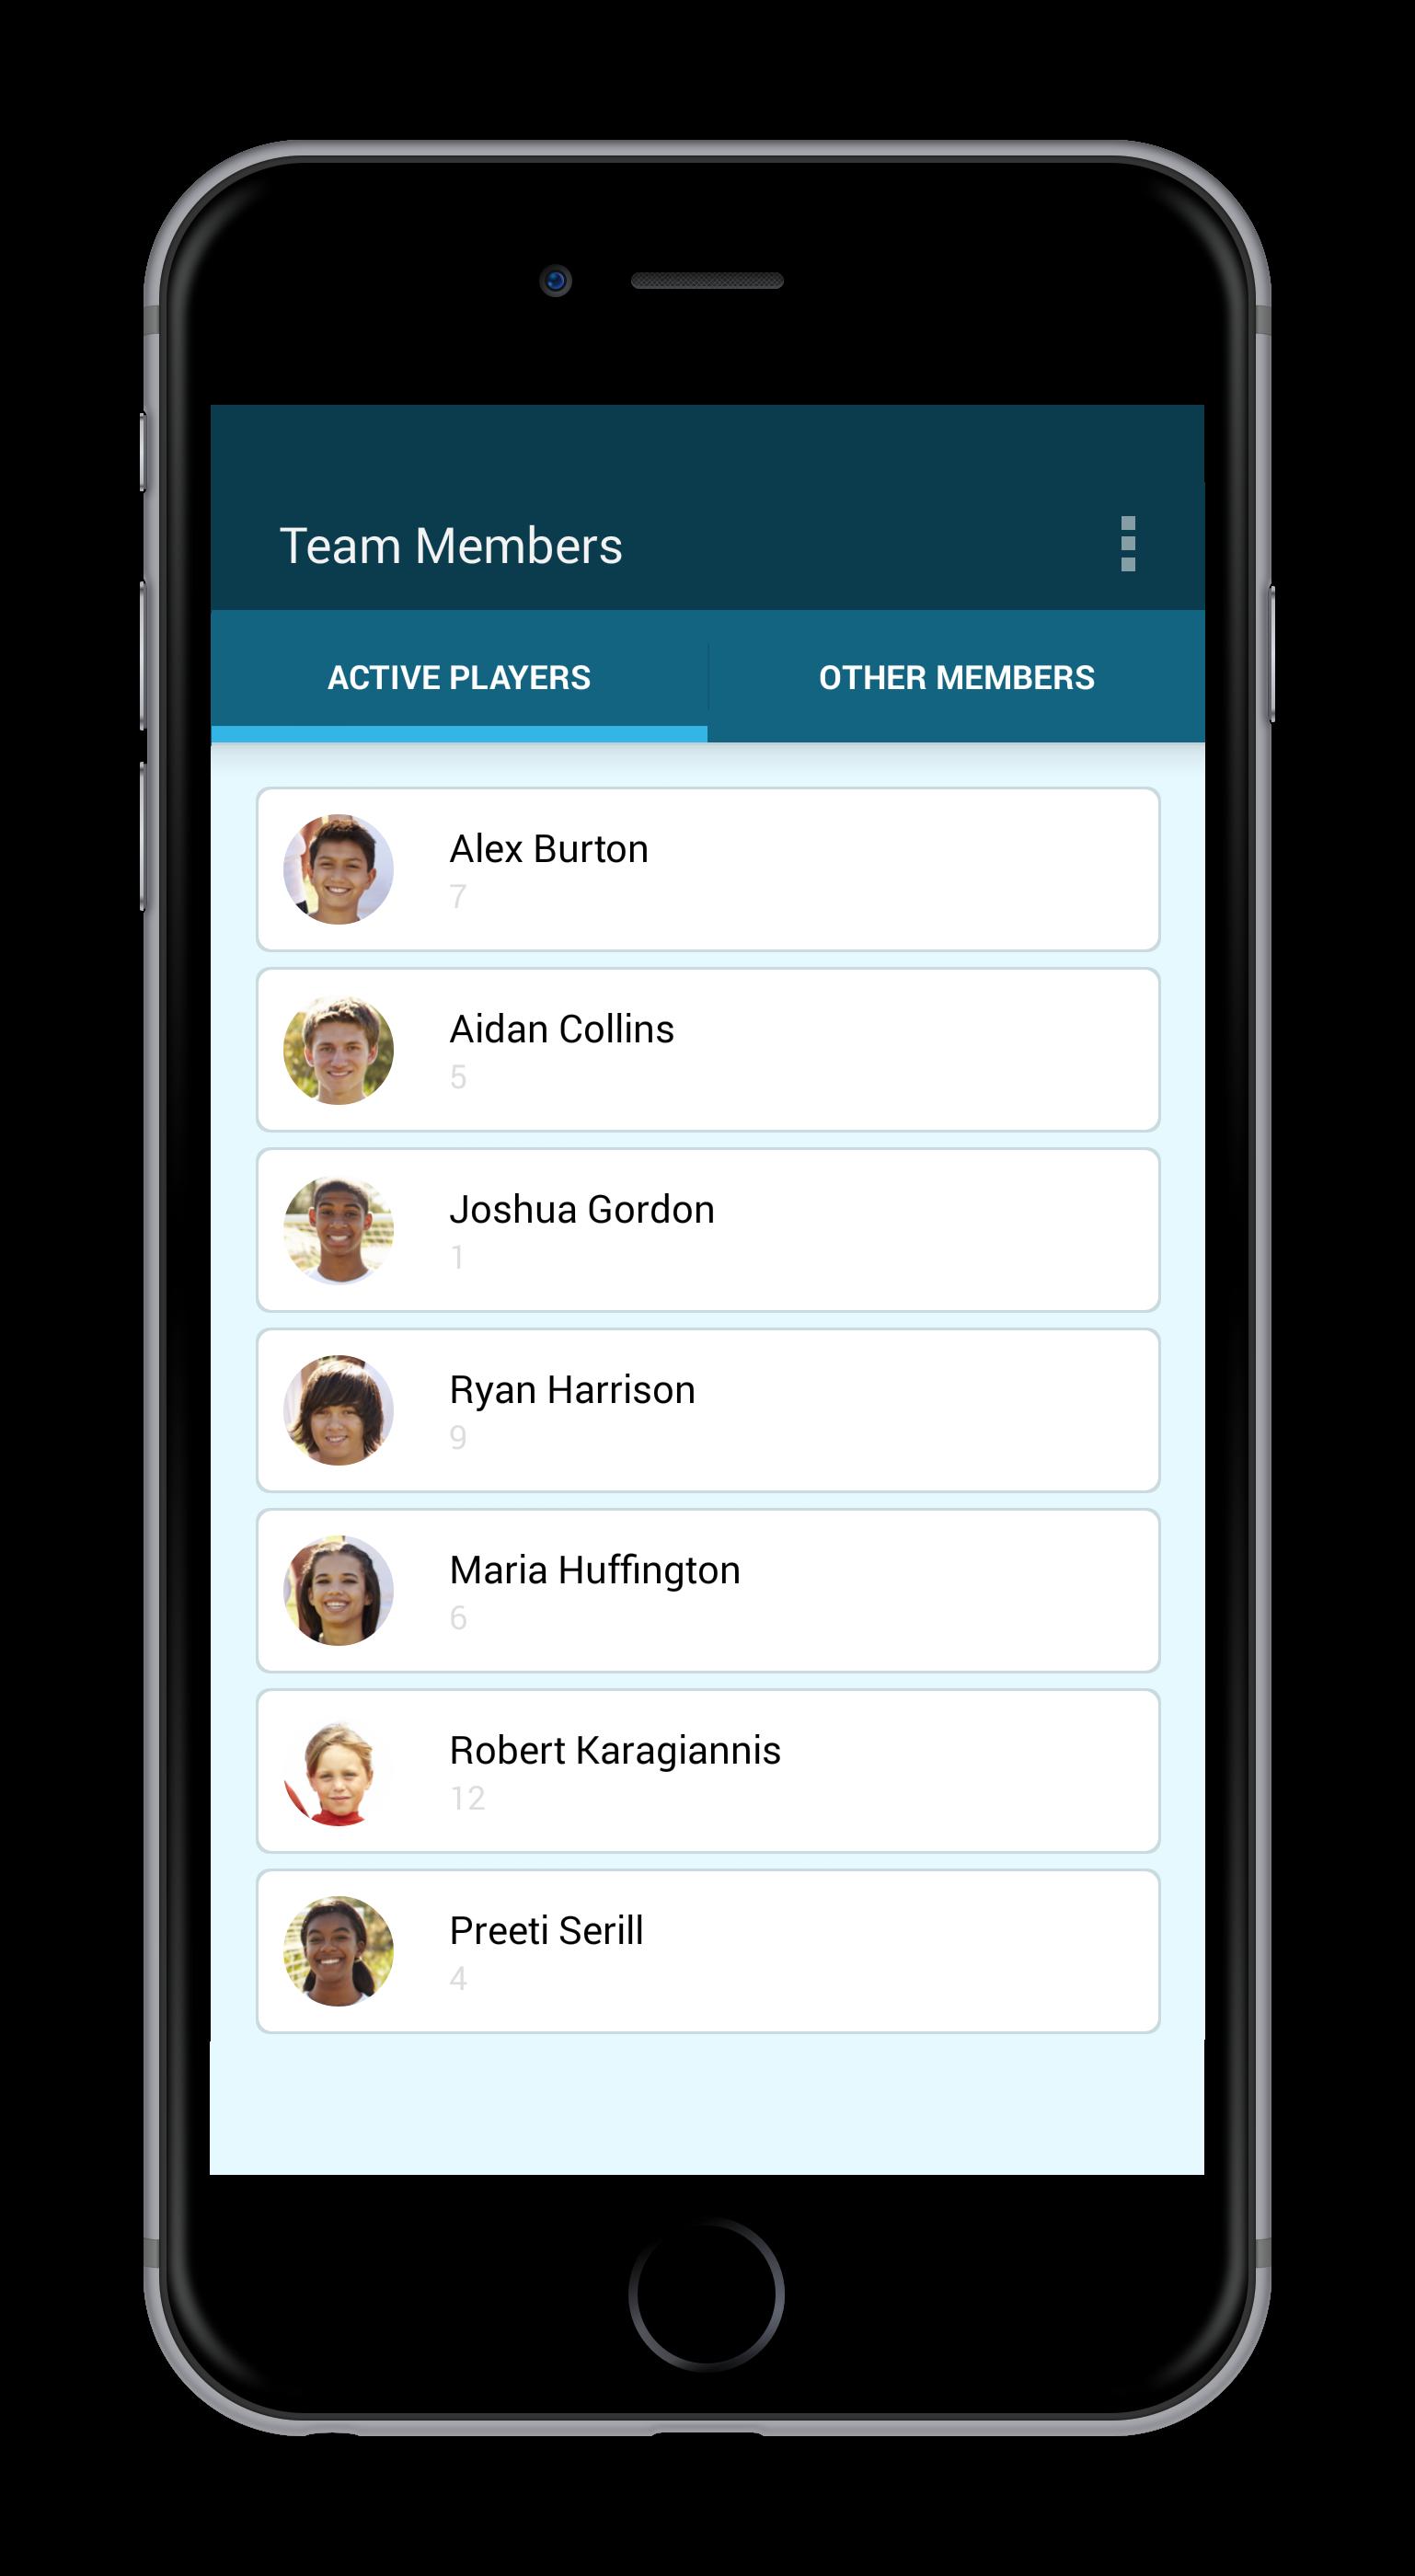 Mobile members list